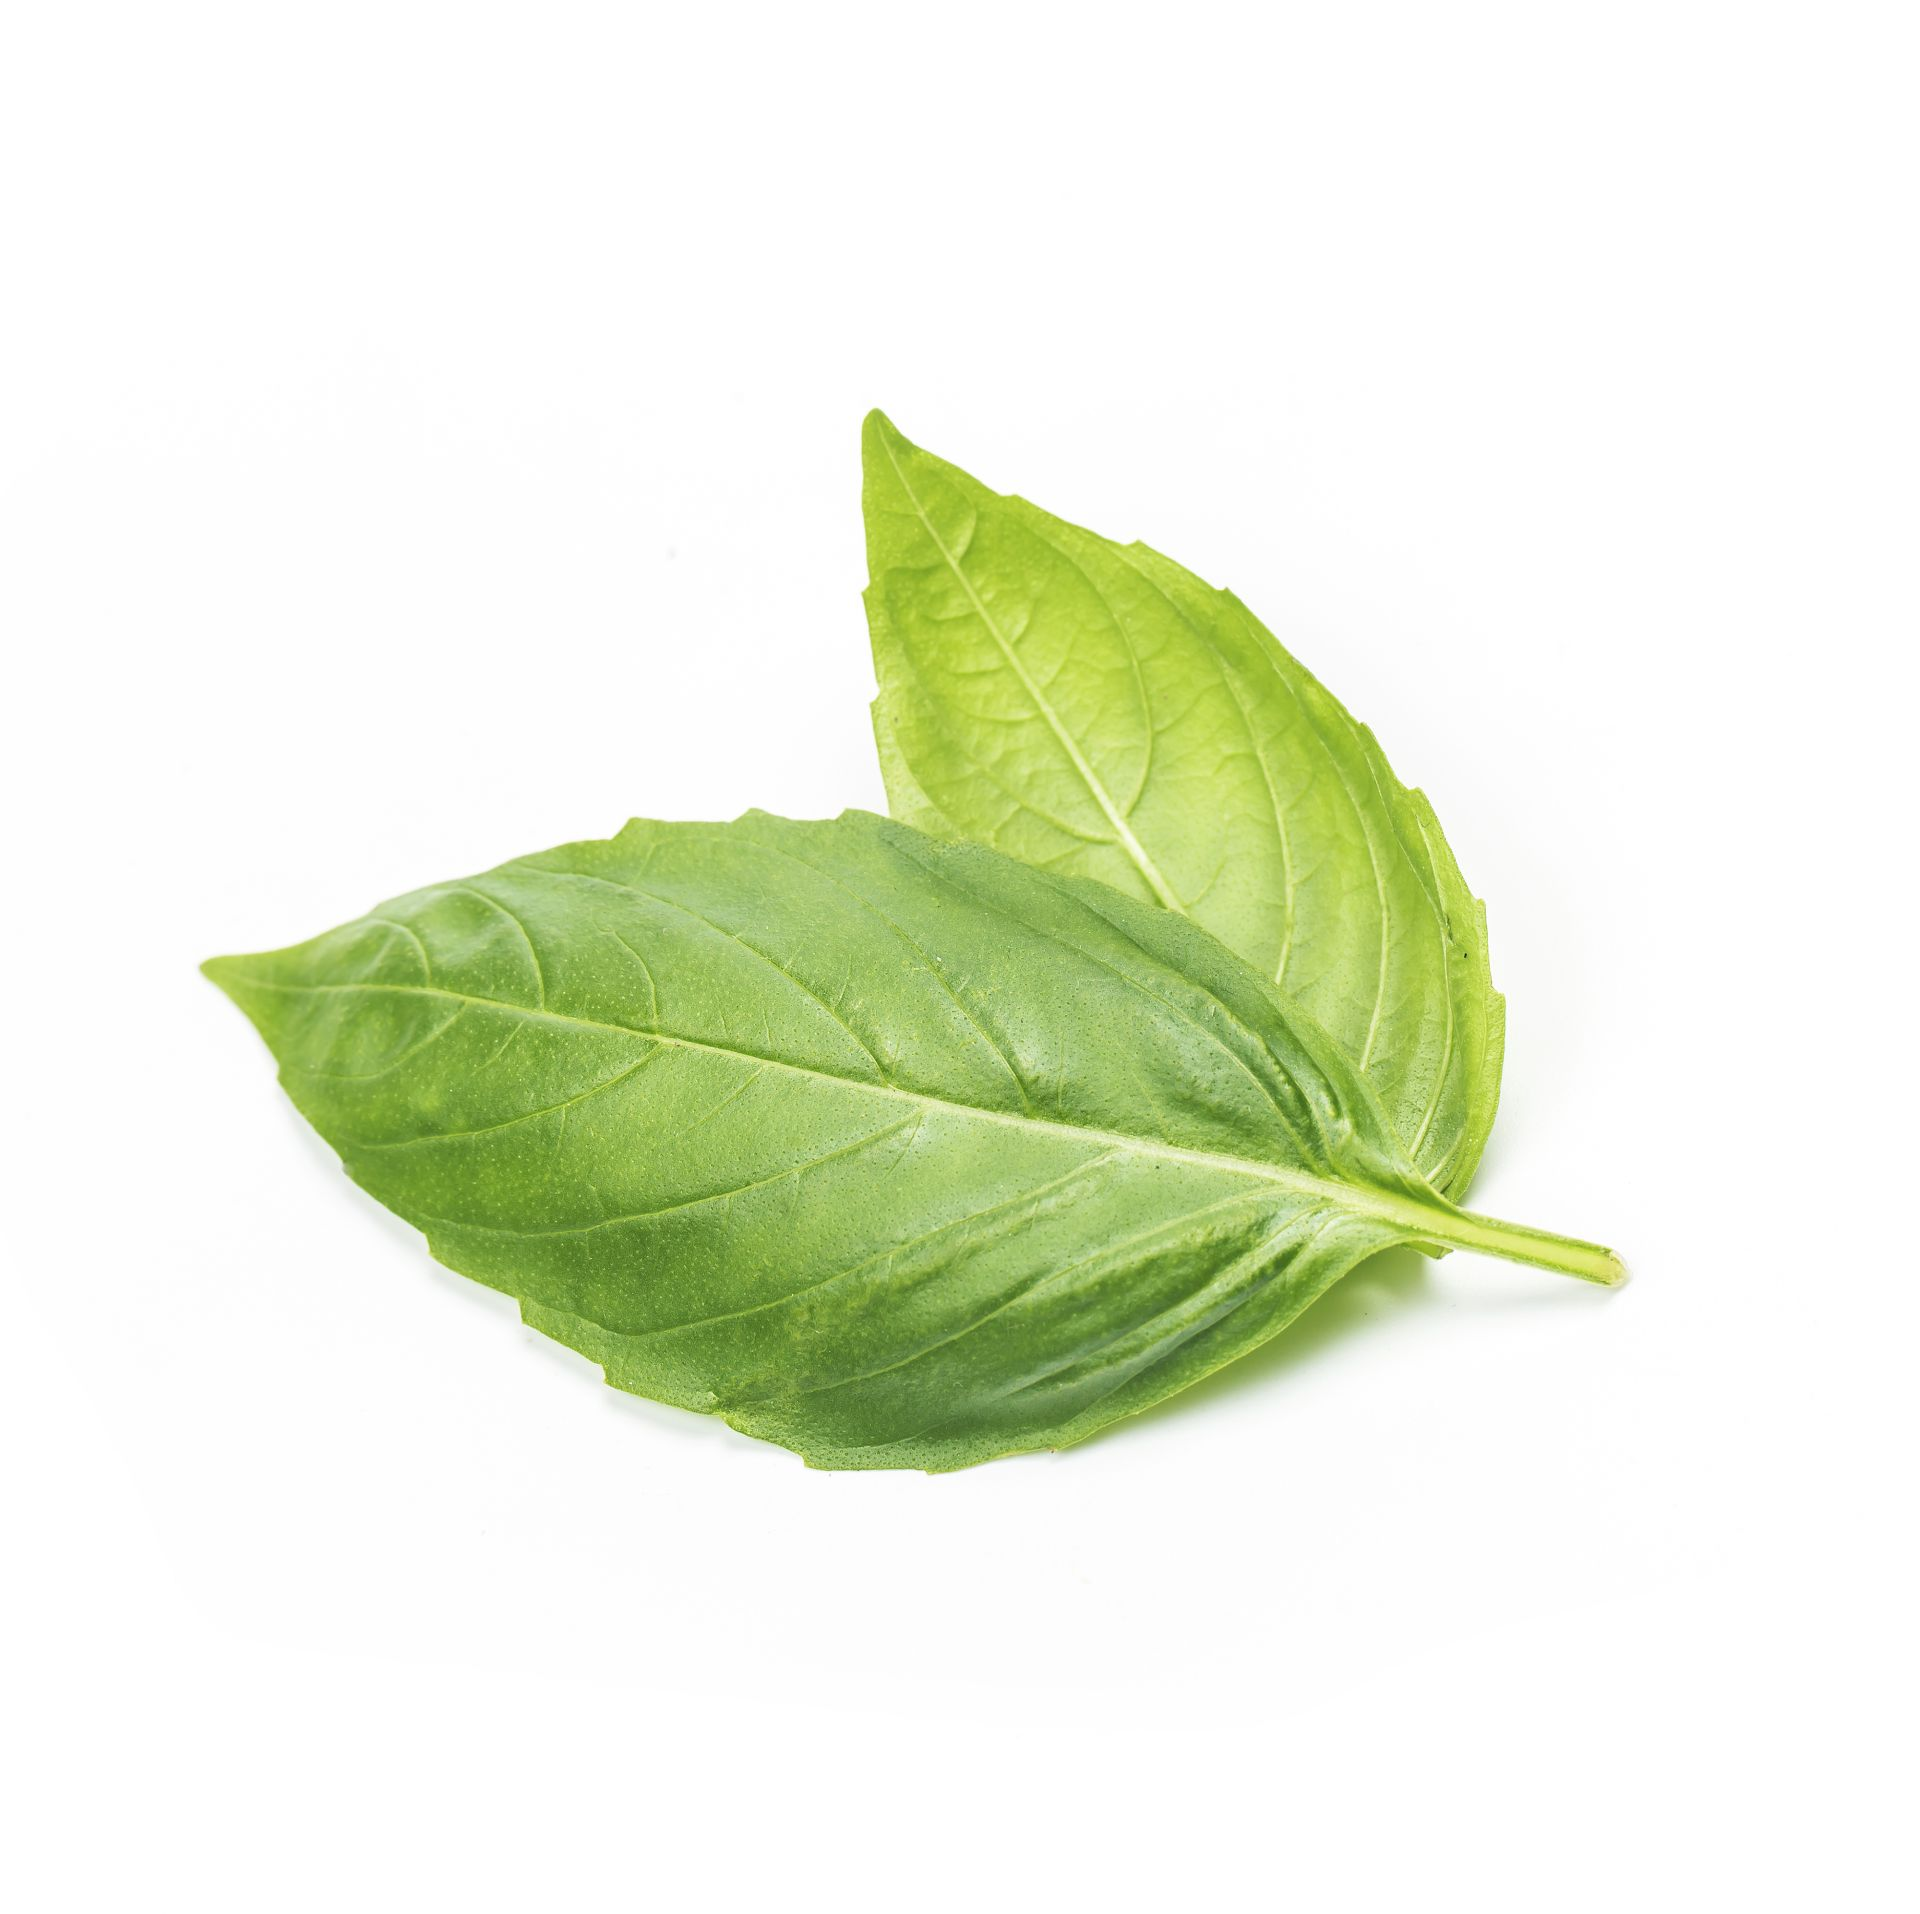 close-up-studio-shot-fresh-green-basil-herb-leaves-isolated-white-background-sweet-genovese-basil